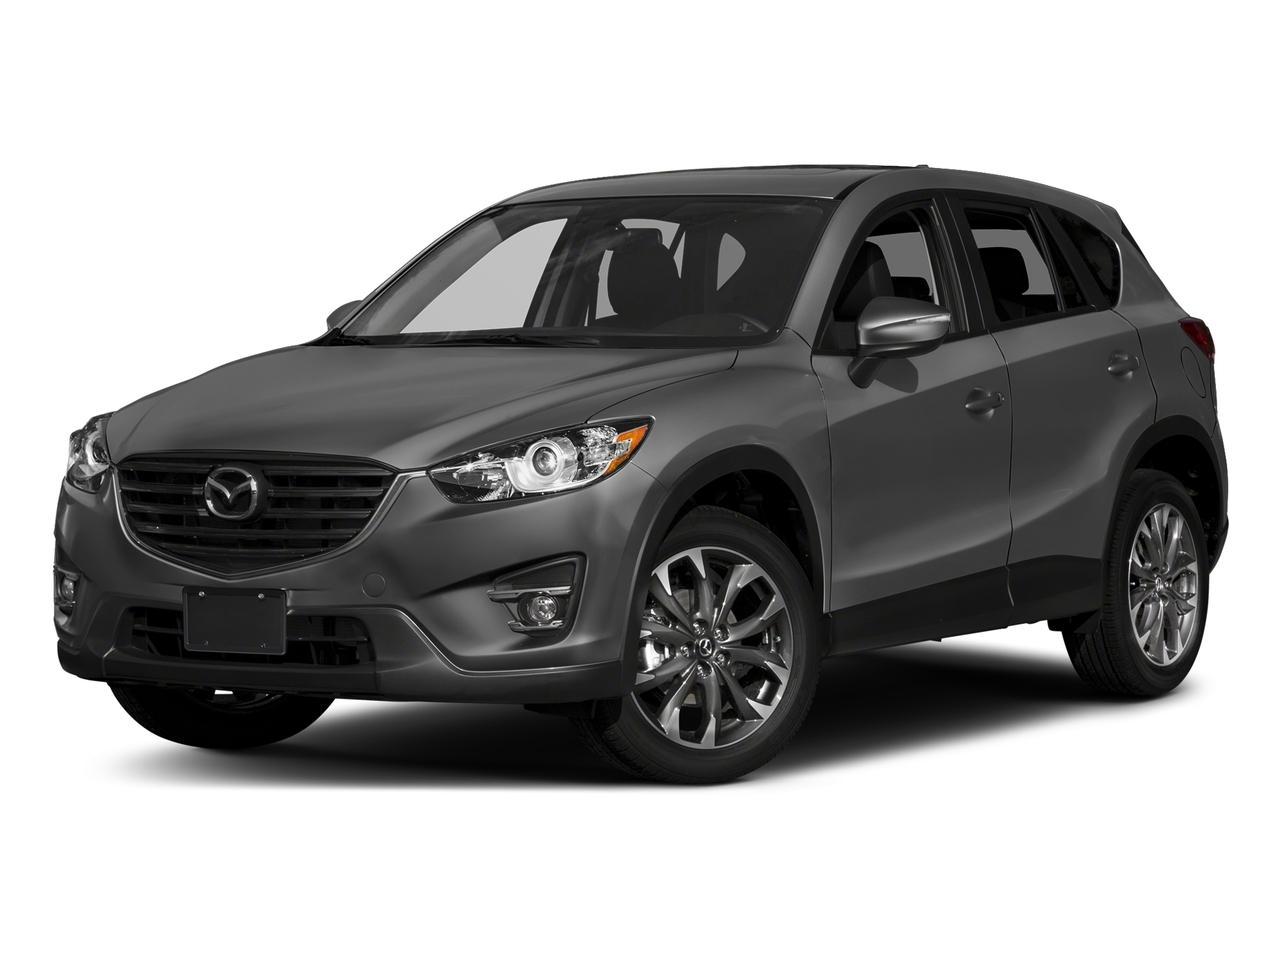 2016 Mazda CX-5 Vehicle Photo in Colma, CA 94014